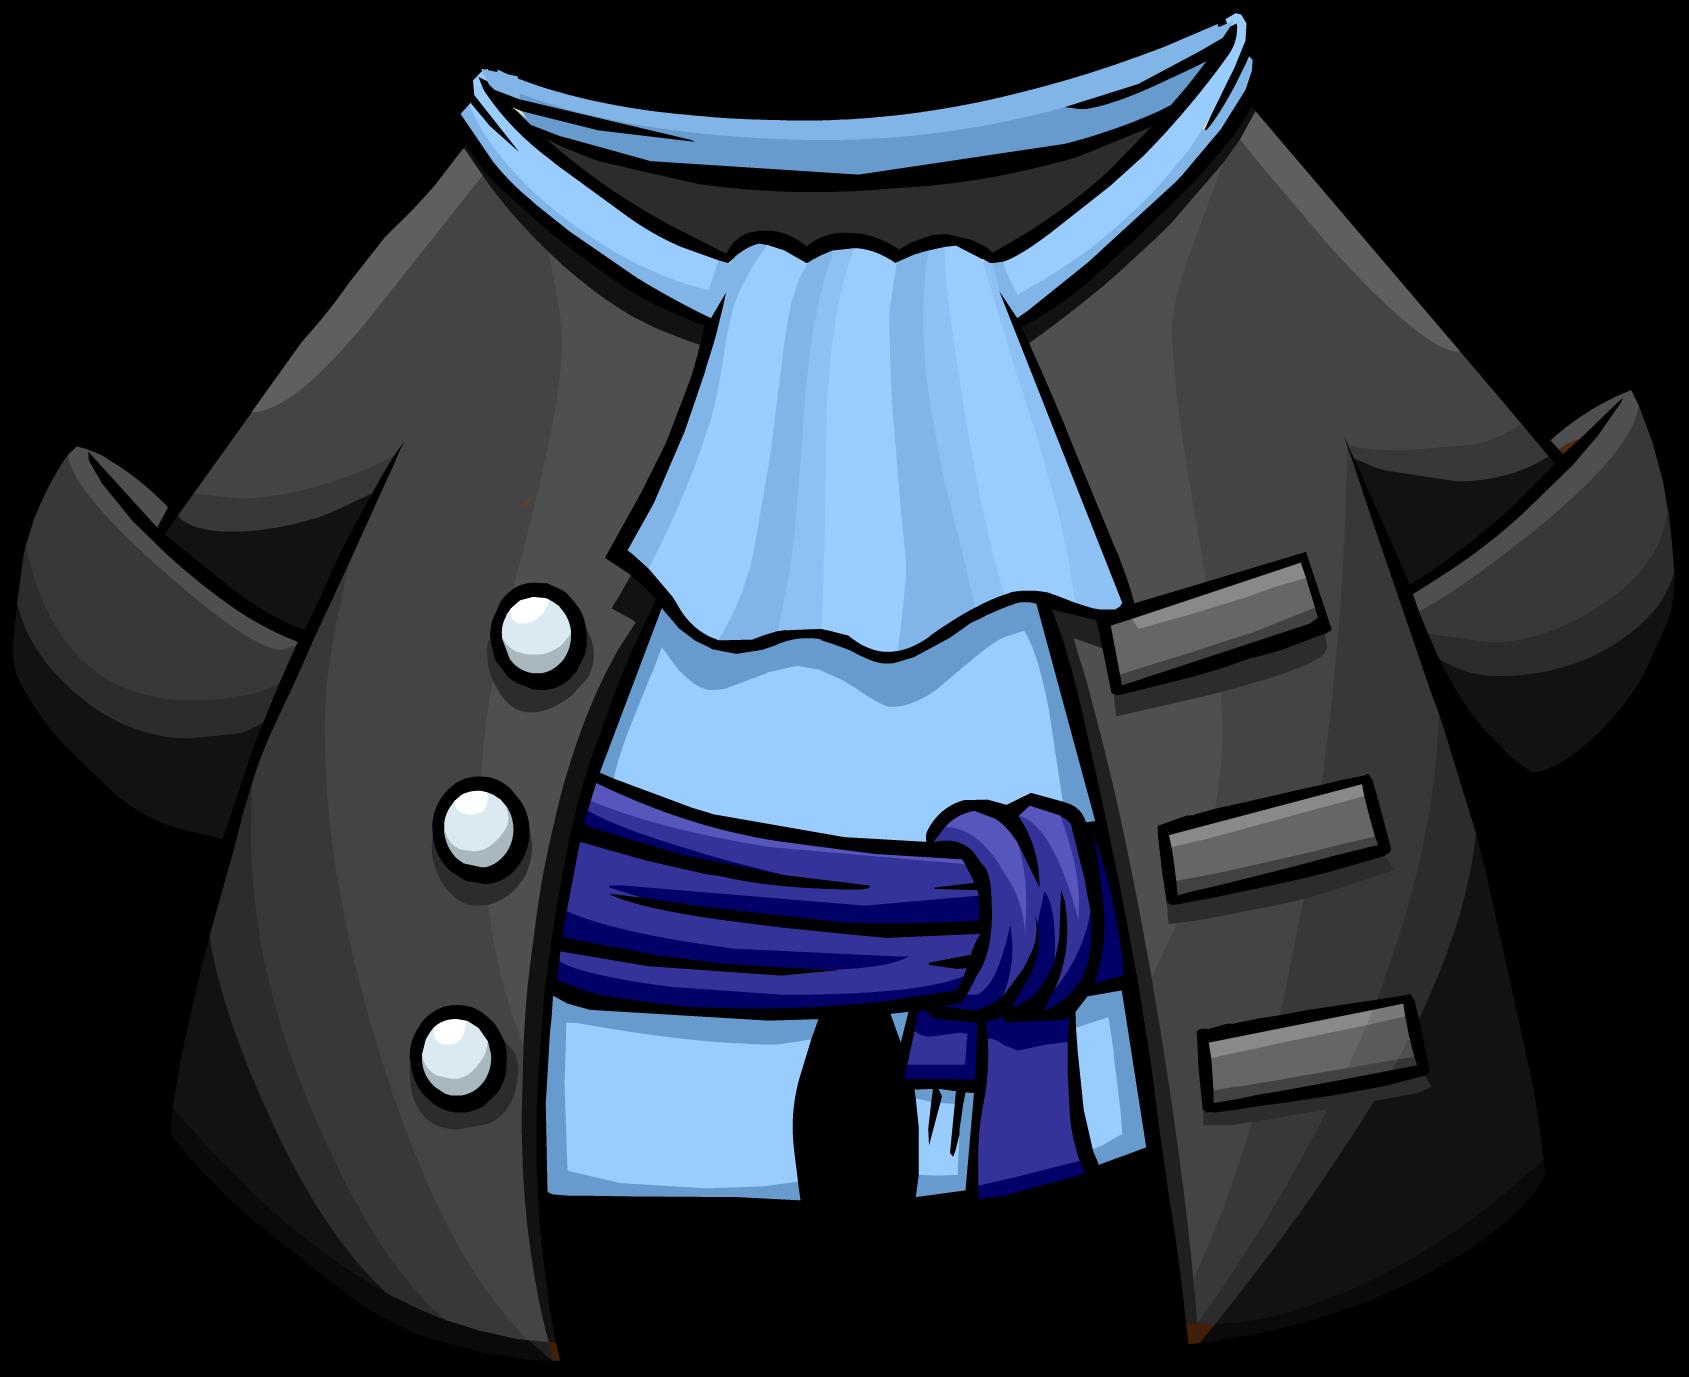 Gray Pirate Coat Club Penguin Wiki Fandom Powered By Wikia